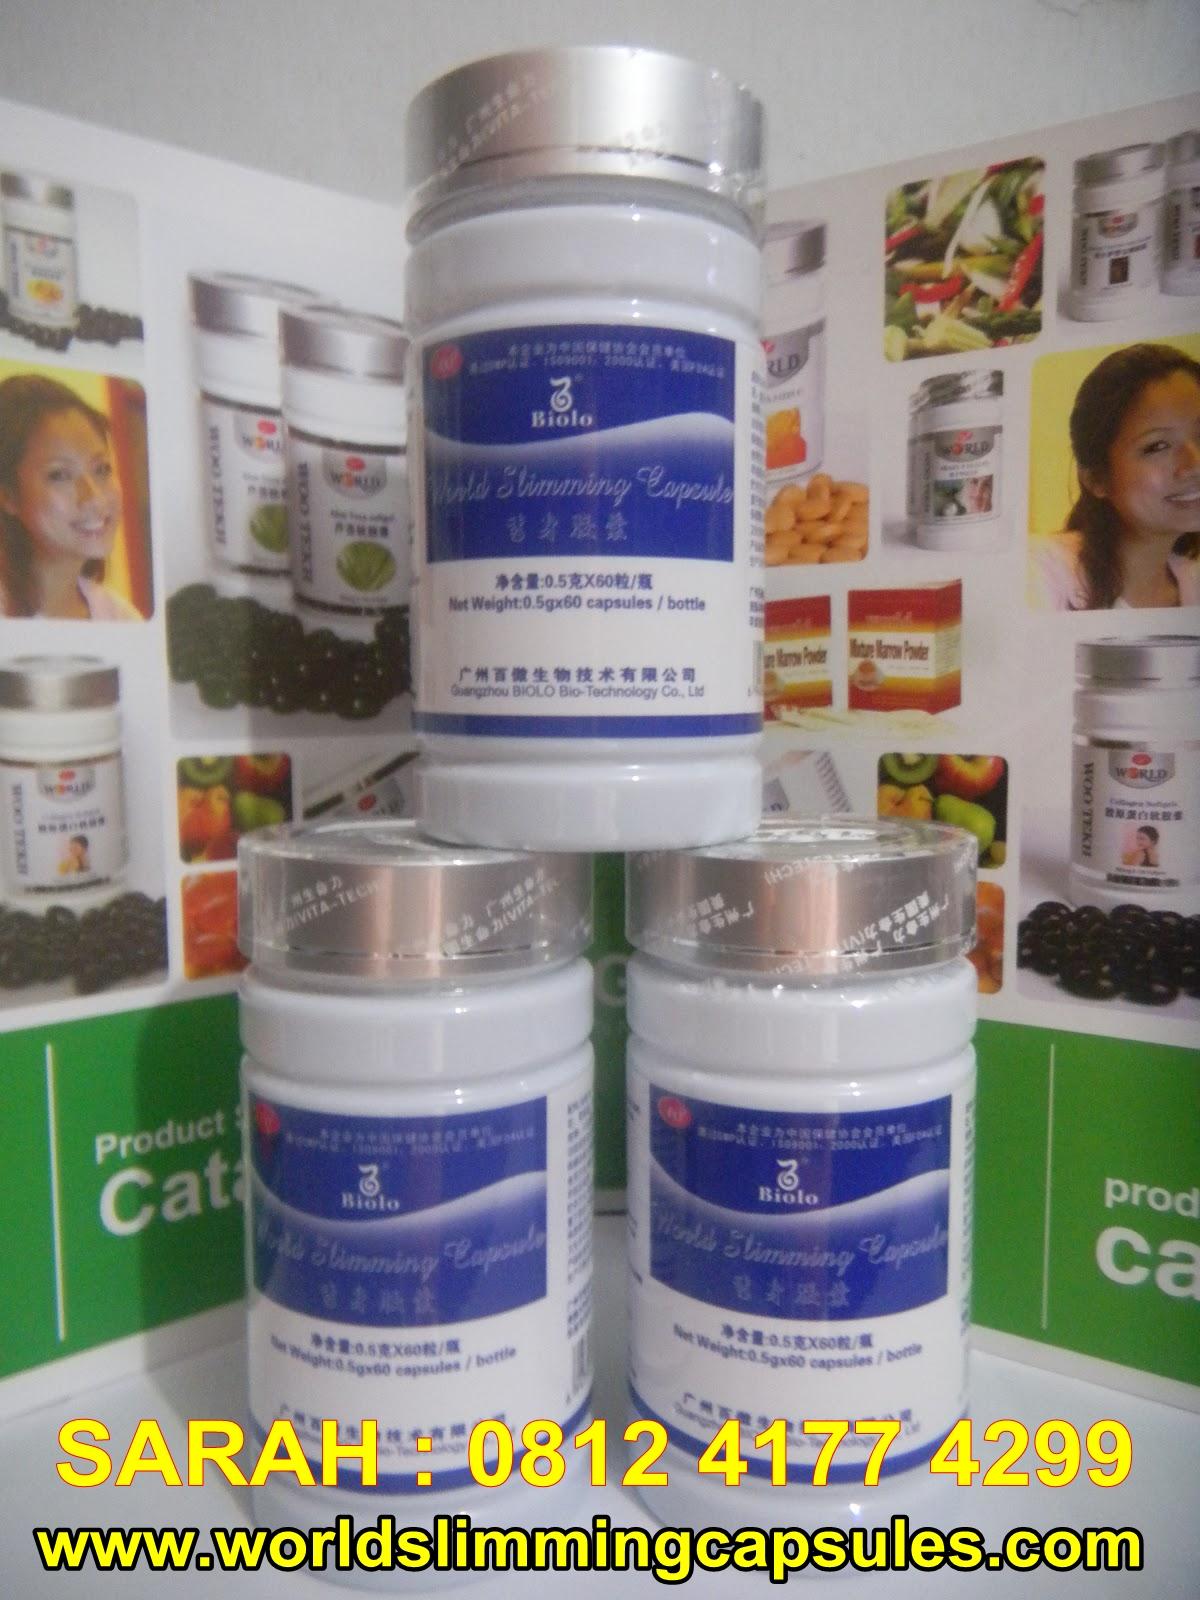 Obat Pelangsing Badan Herbal Alami Biolo Wsc | Caroldoey